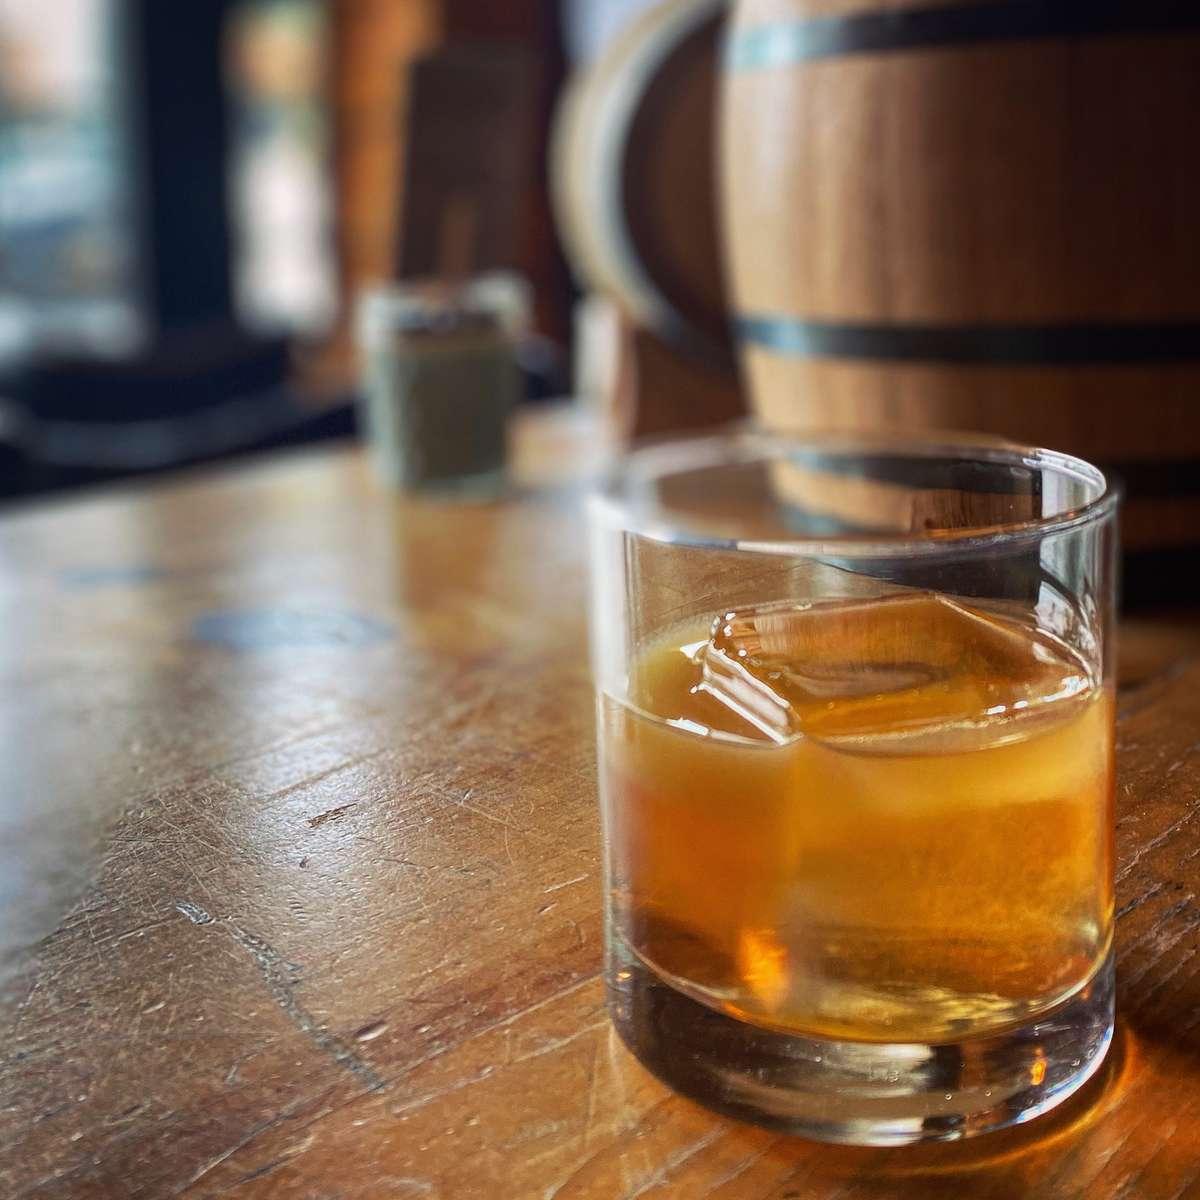 The Beast of Bourbon